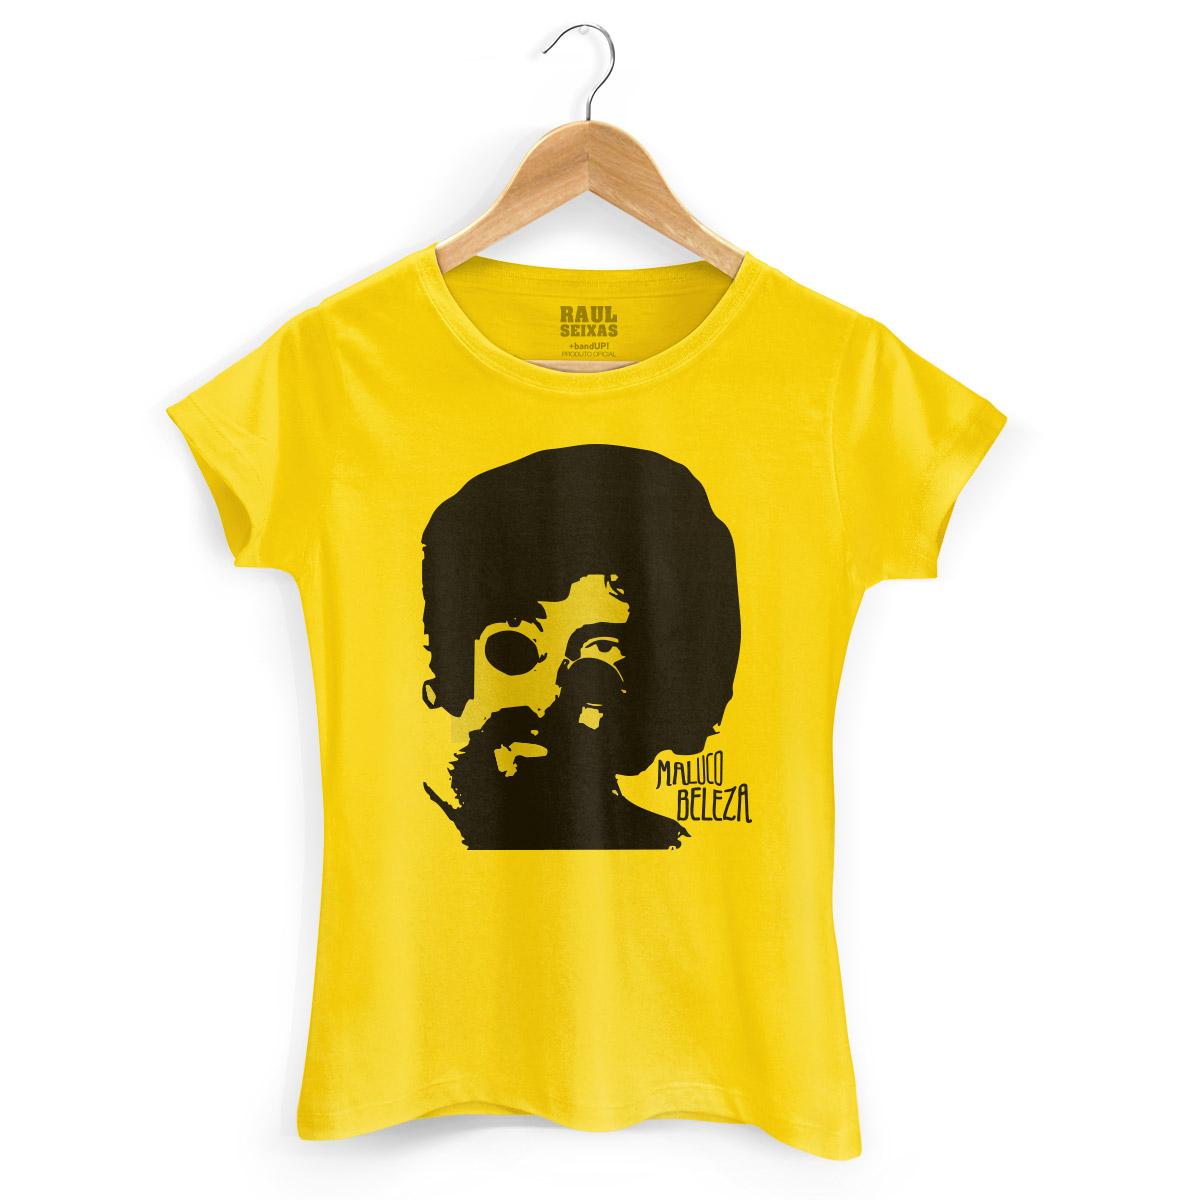 Camiseta Feminina Raul Seixas Maluco Beleza